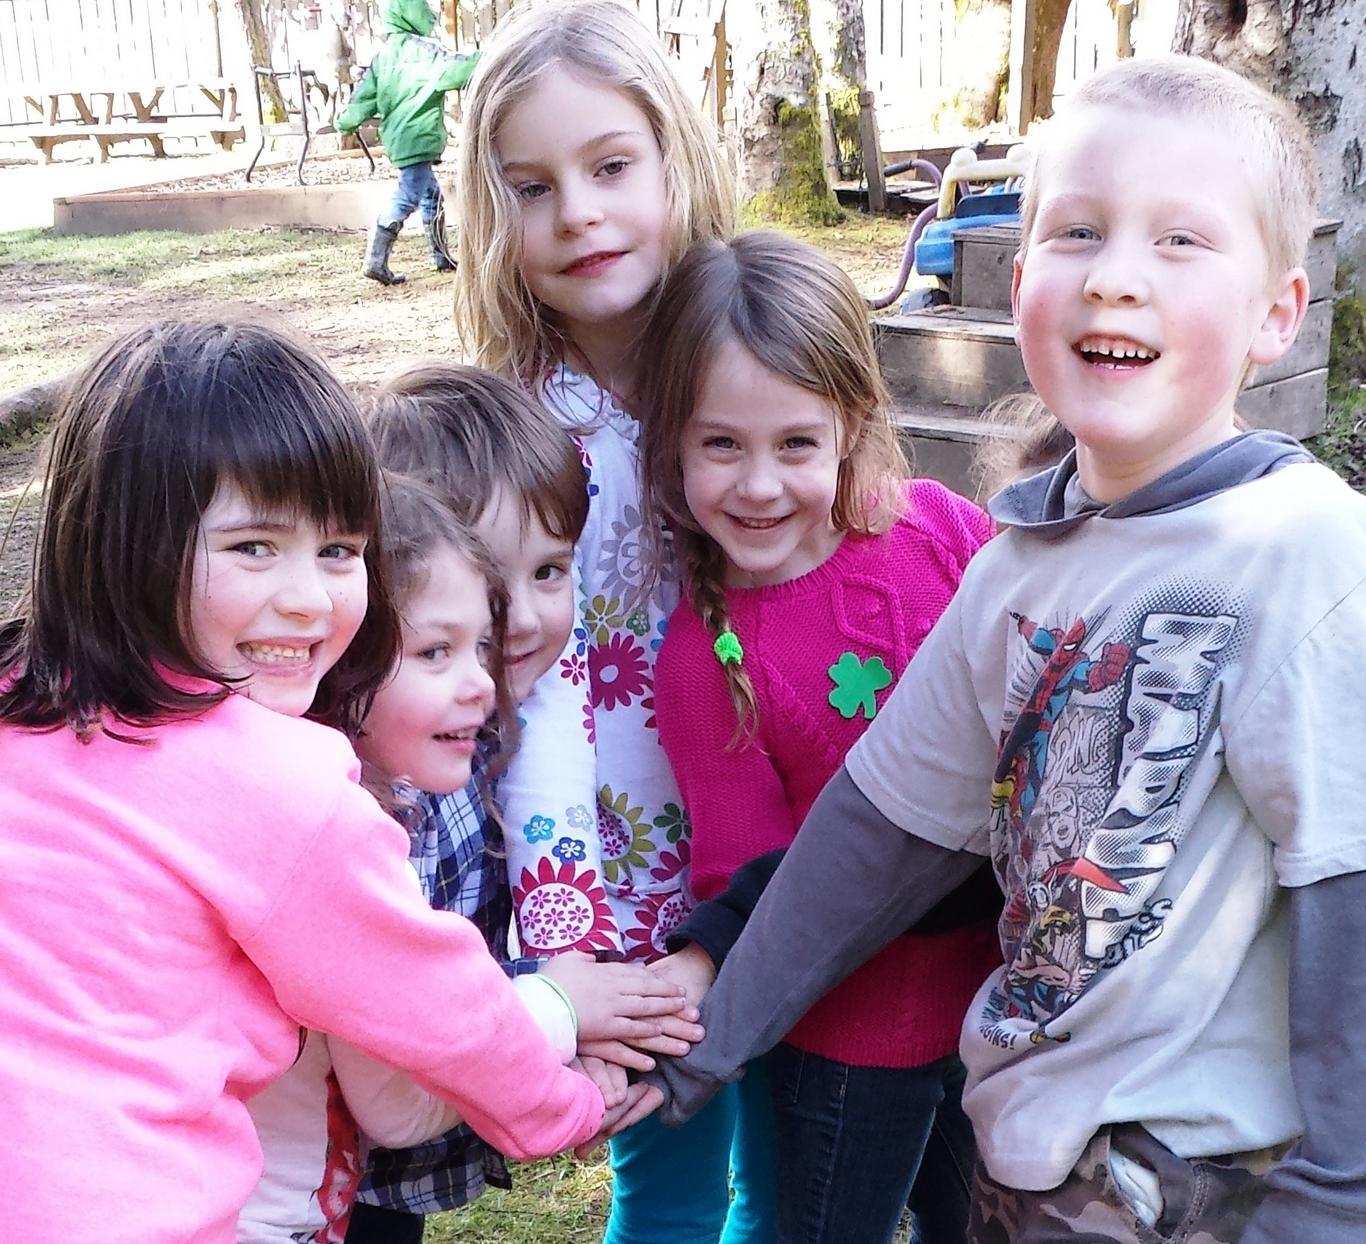 Children make lifelong friends in the child care program at Village Learning